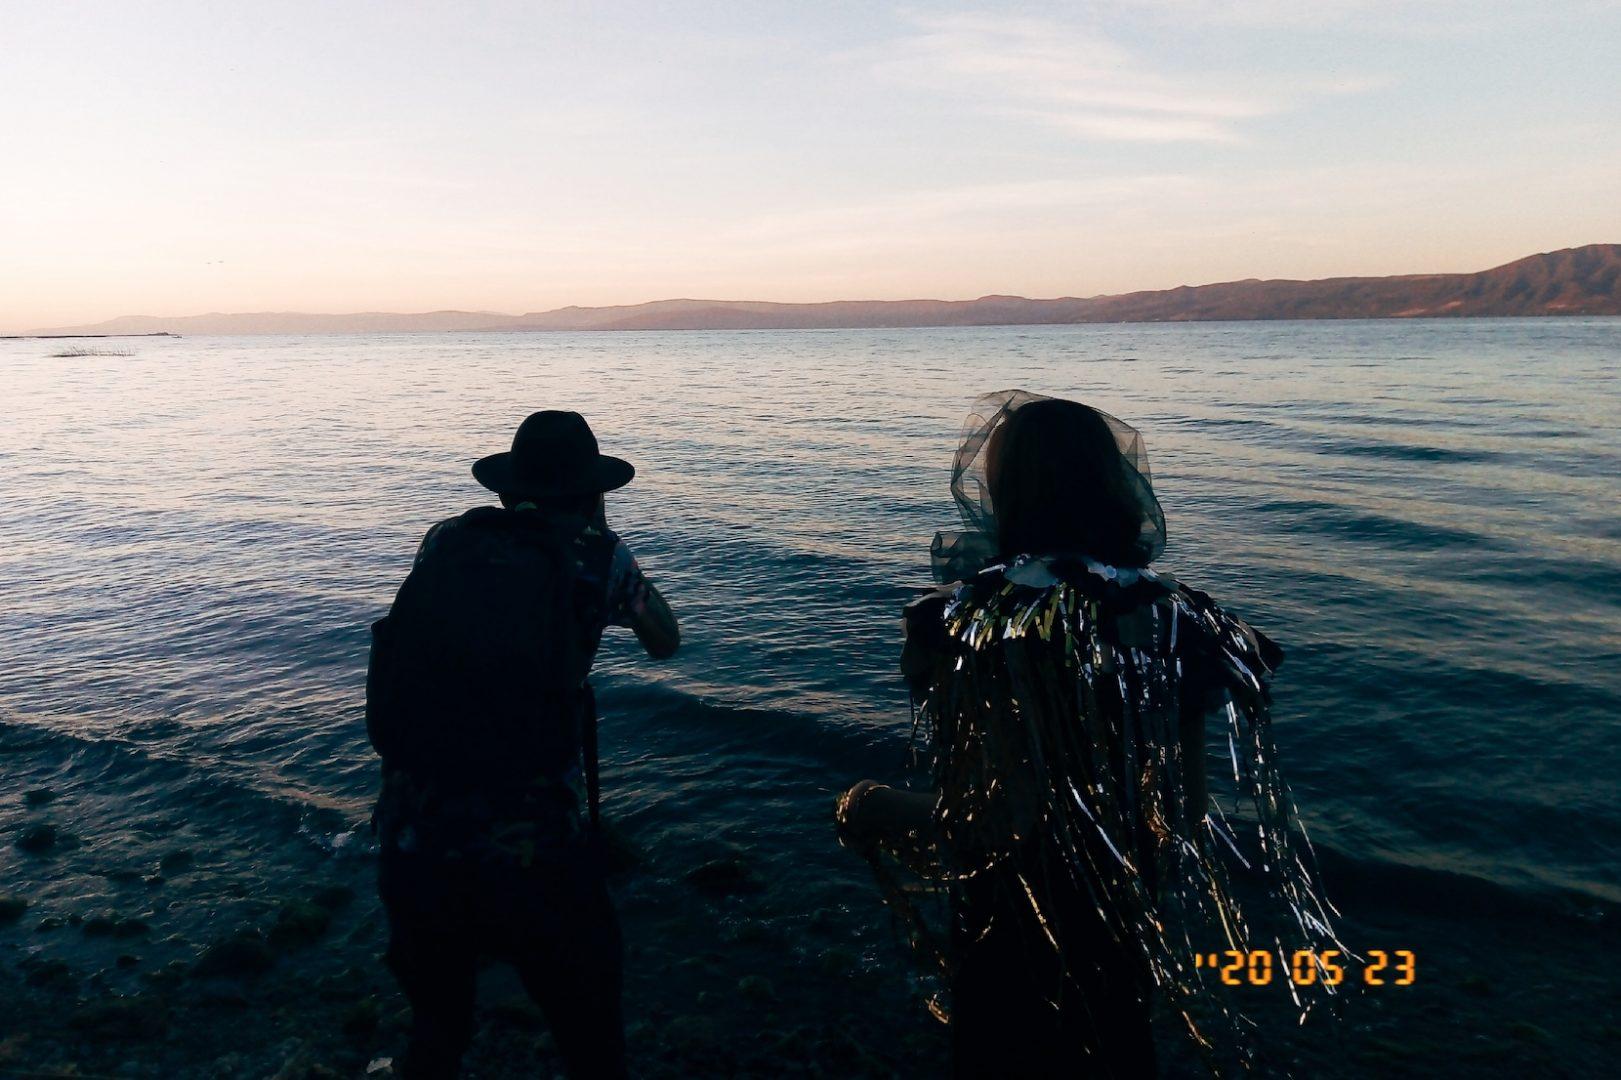 Rodrigo and Hanna entering the lake, photo by @sirlemat